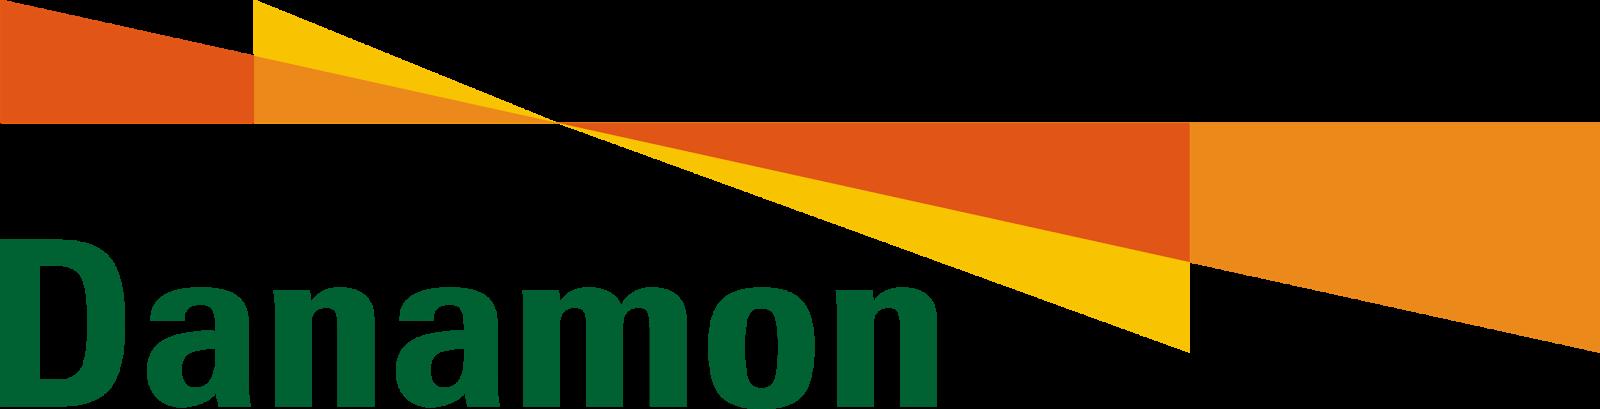 Logo Bank Danamon Indonesia - Free Vector CDR - Logo